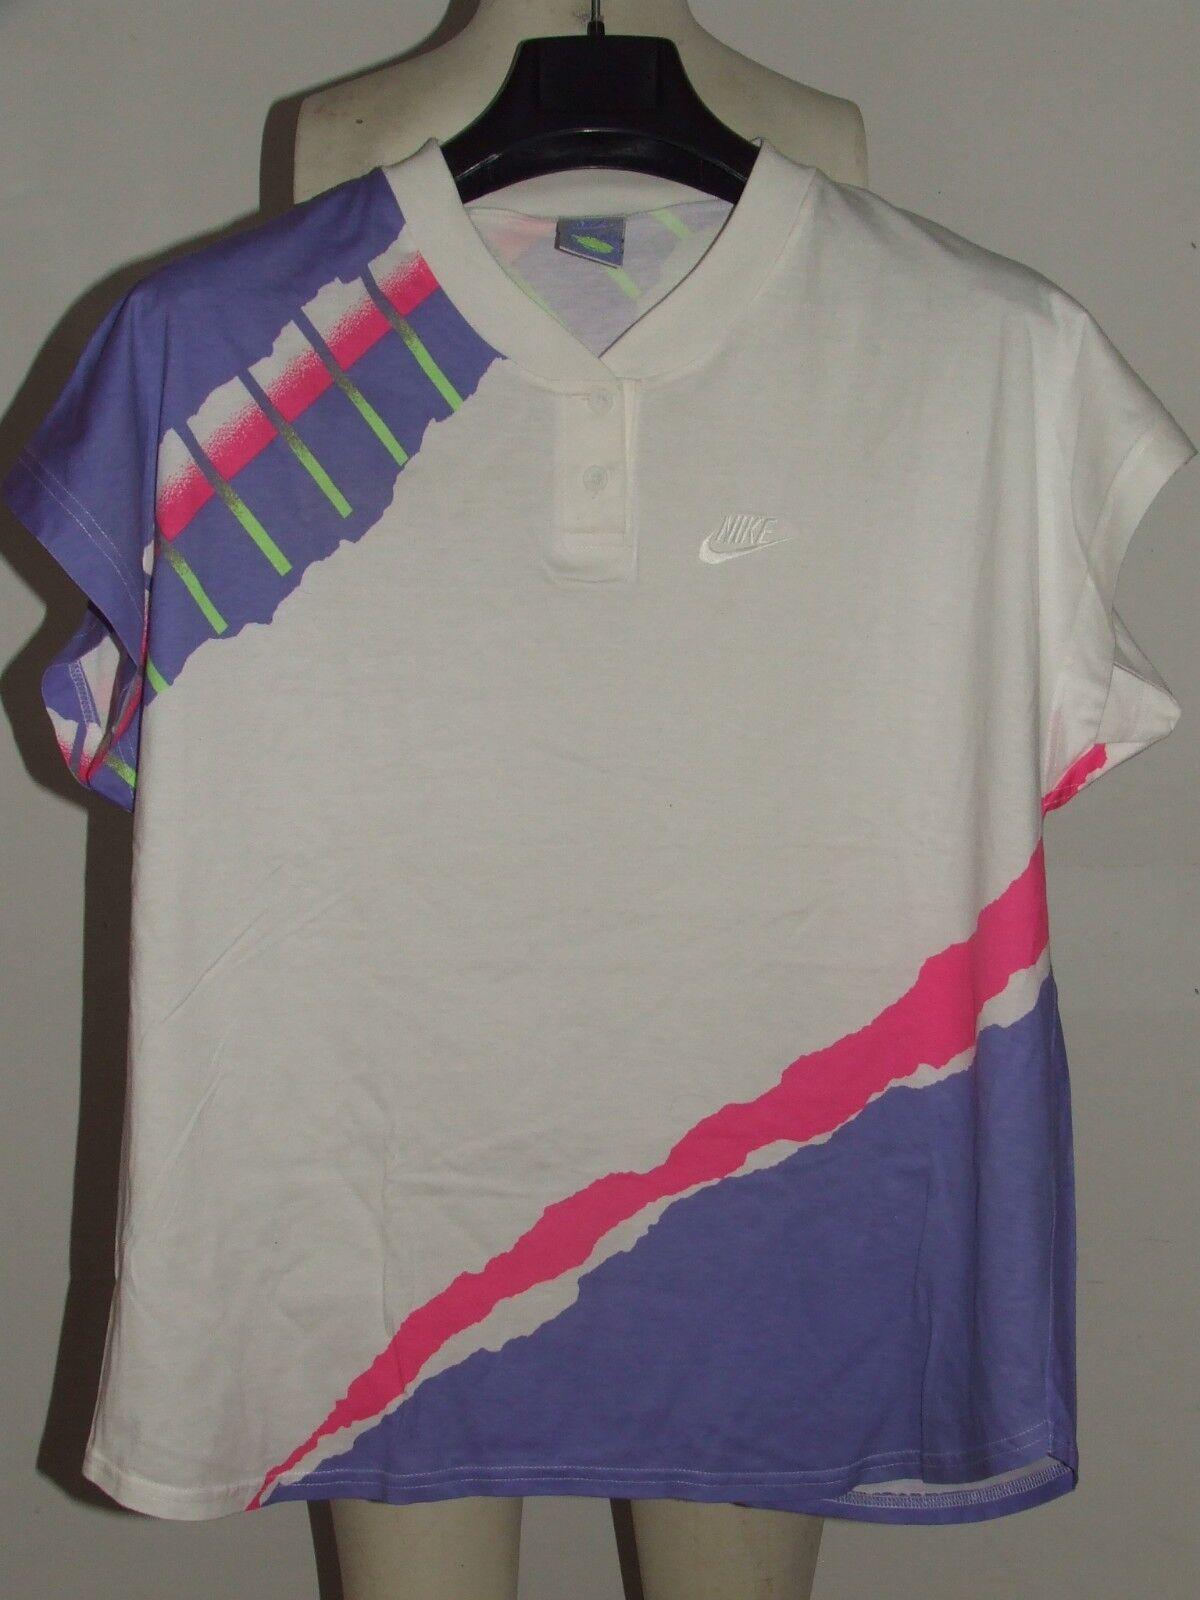 Trikot Trikot Maillot Tennis polo vintage Nike challenge Court TG. l